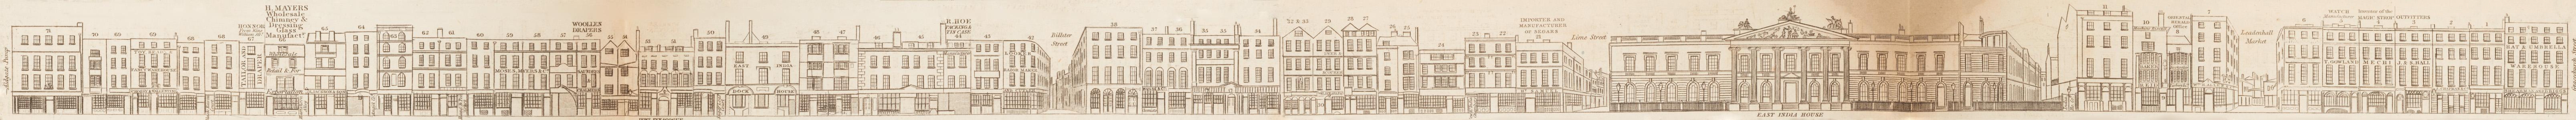 map - Tallis's London street views : No. 2. Leadenhall Street (south)